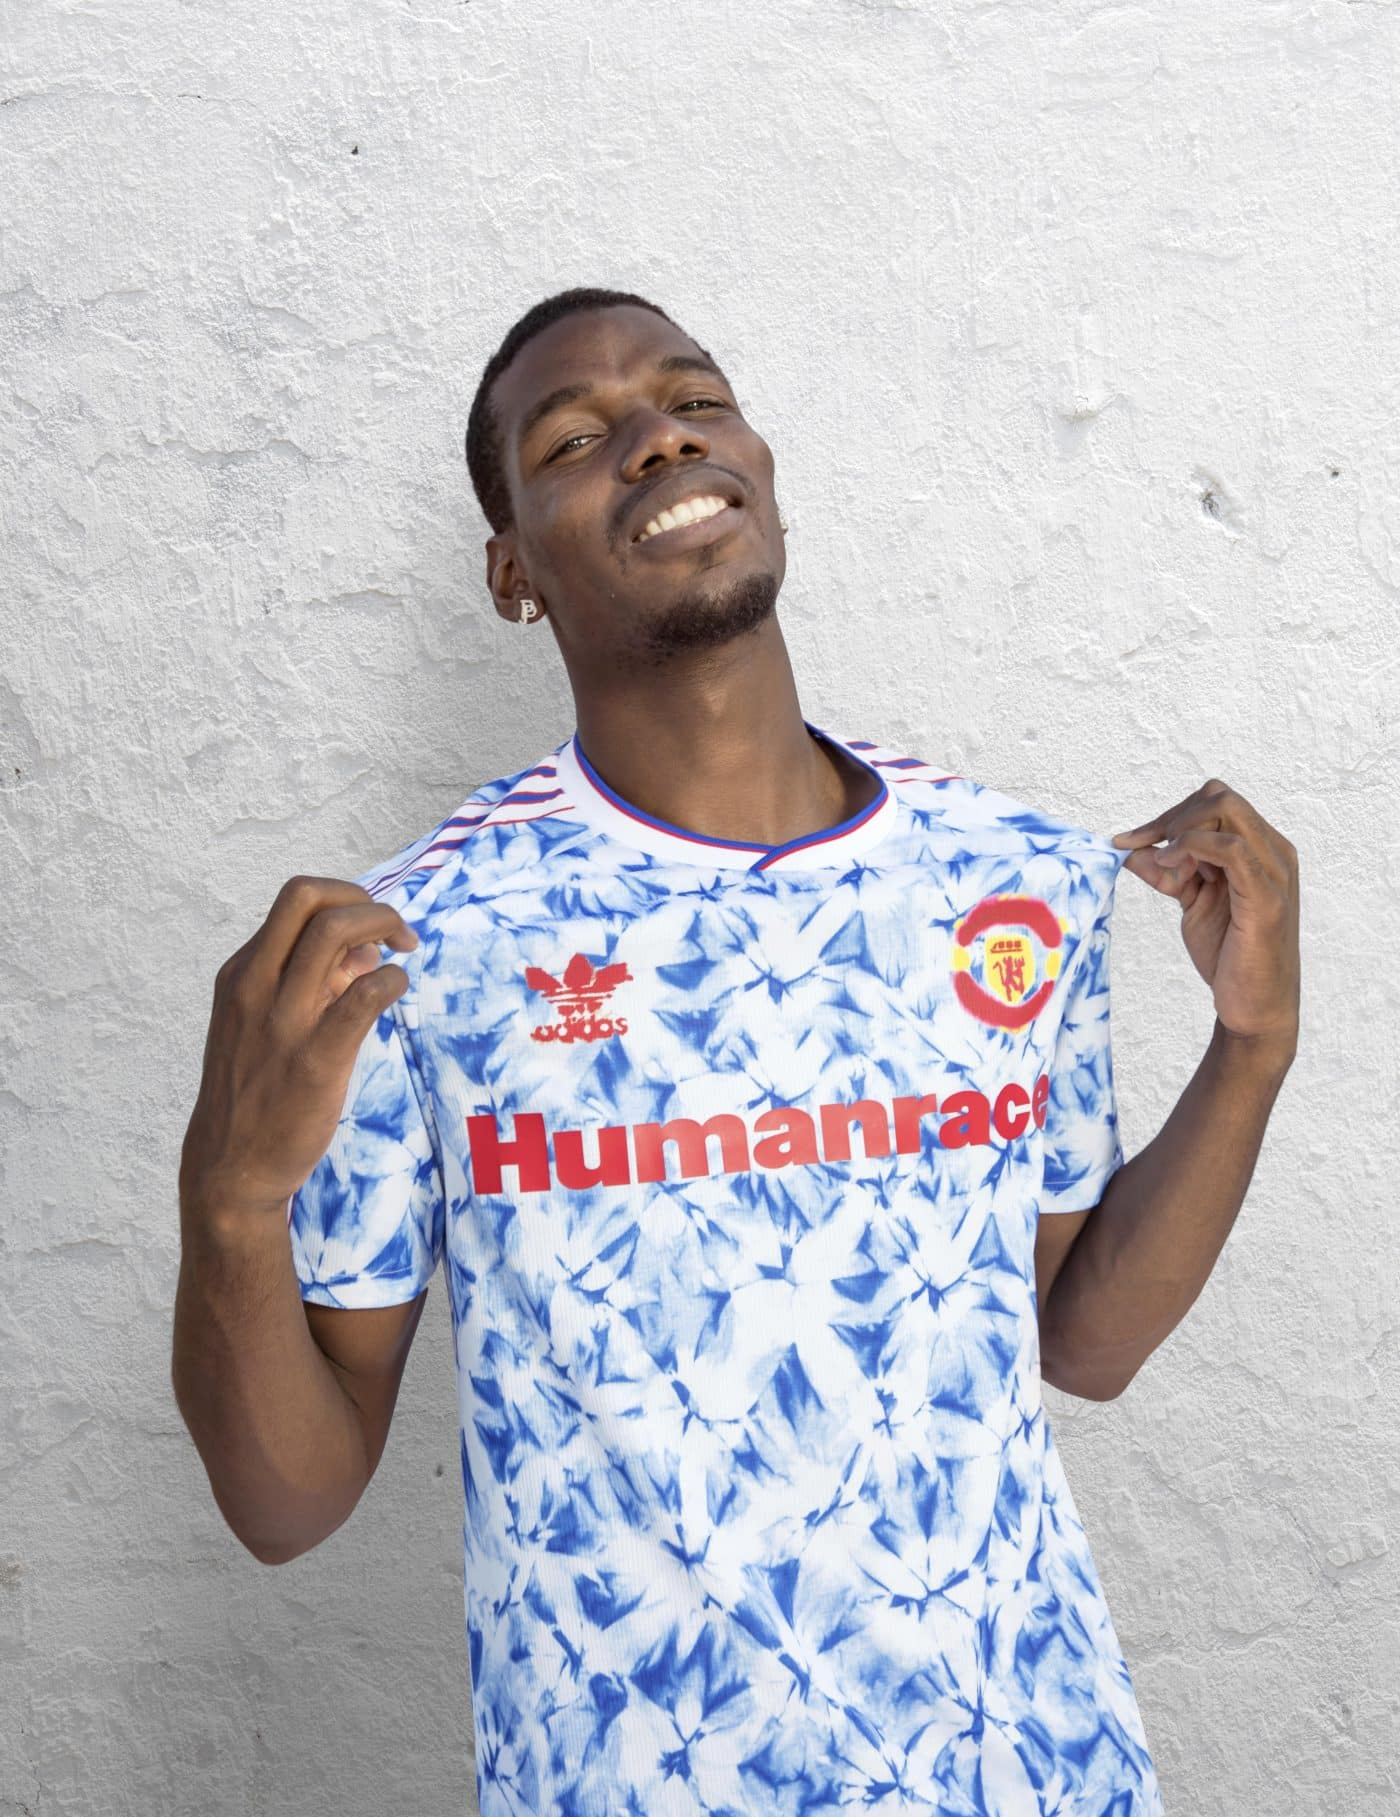 maillot-manchester-united-humanrace-pharrell-williams